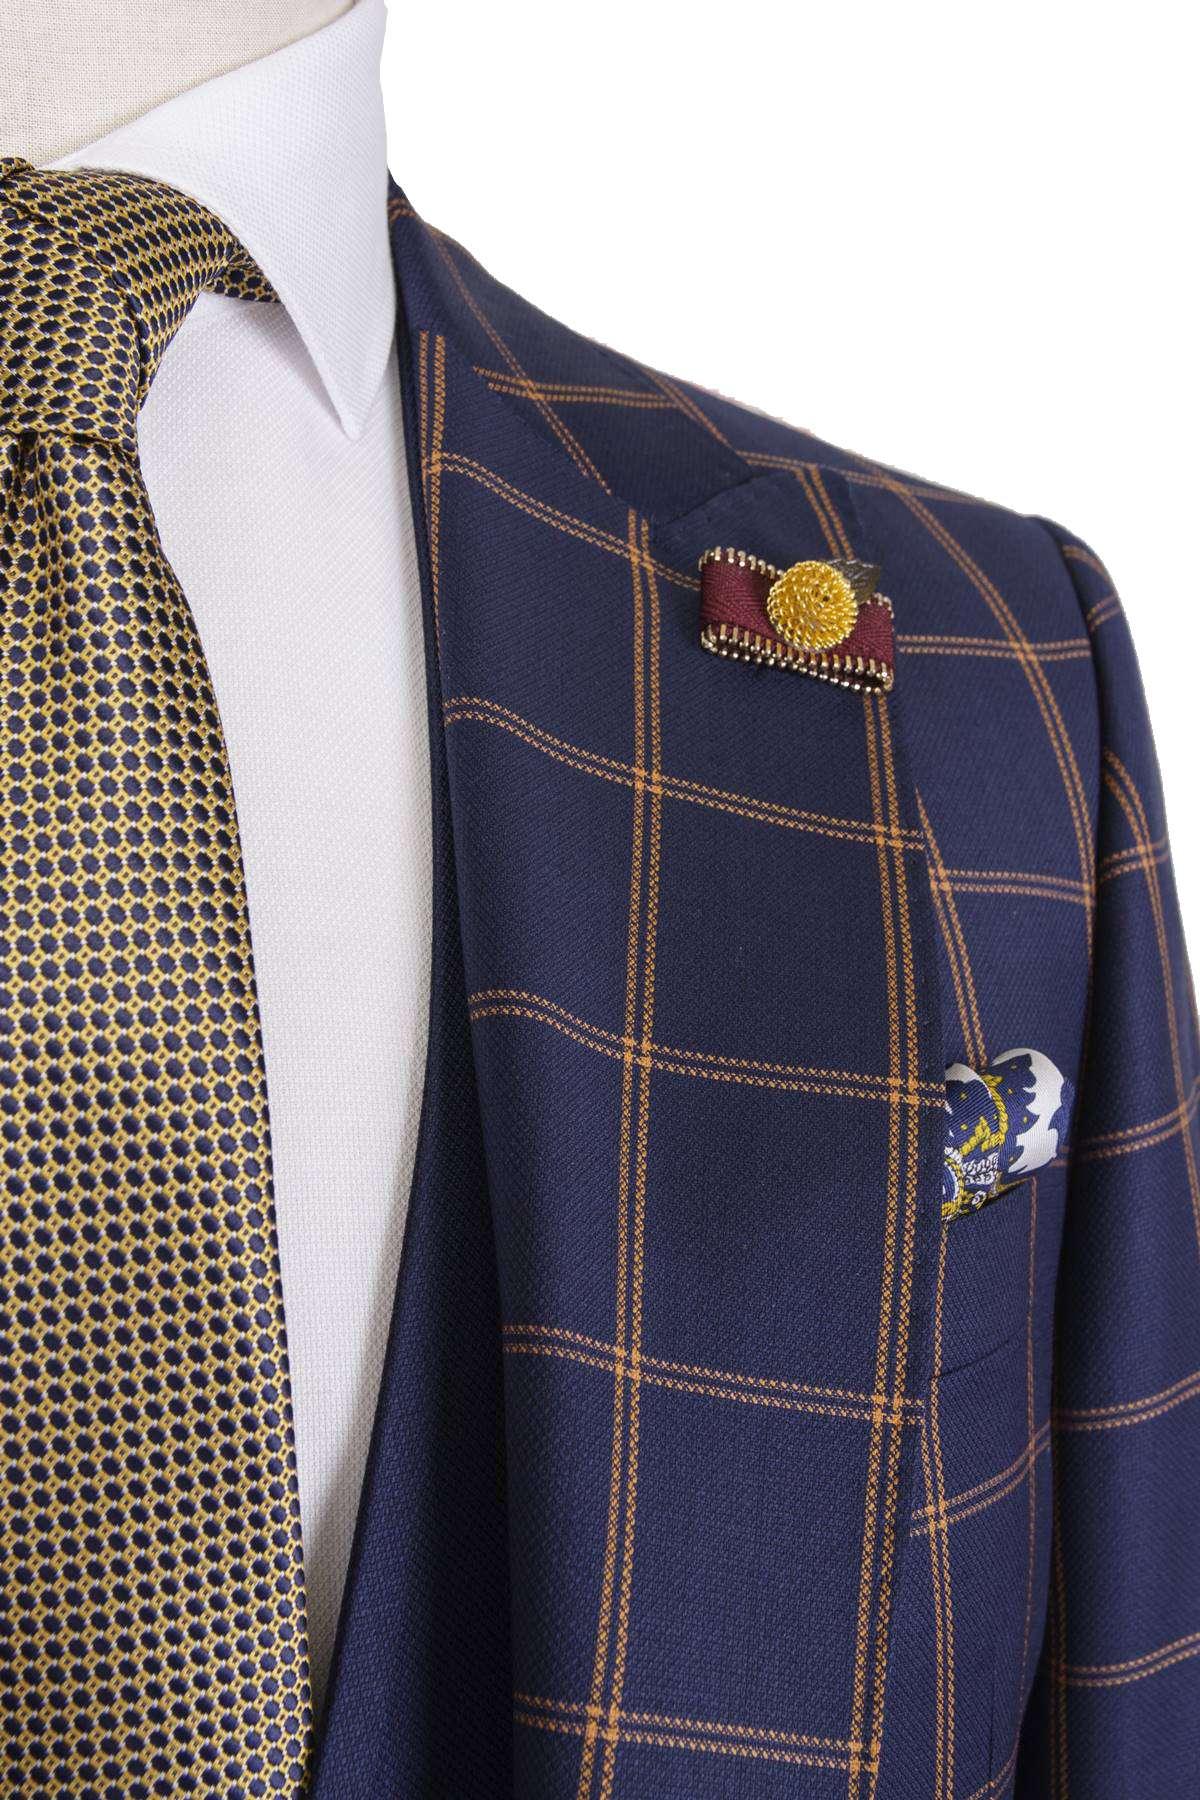 Bespoke Casual Suit - Carouri Navy Blue